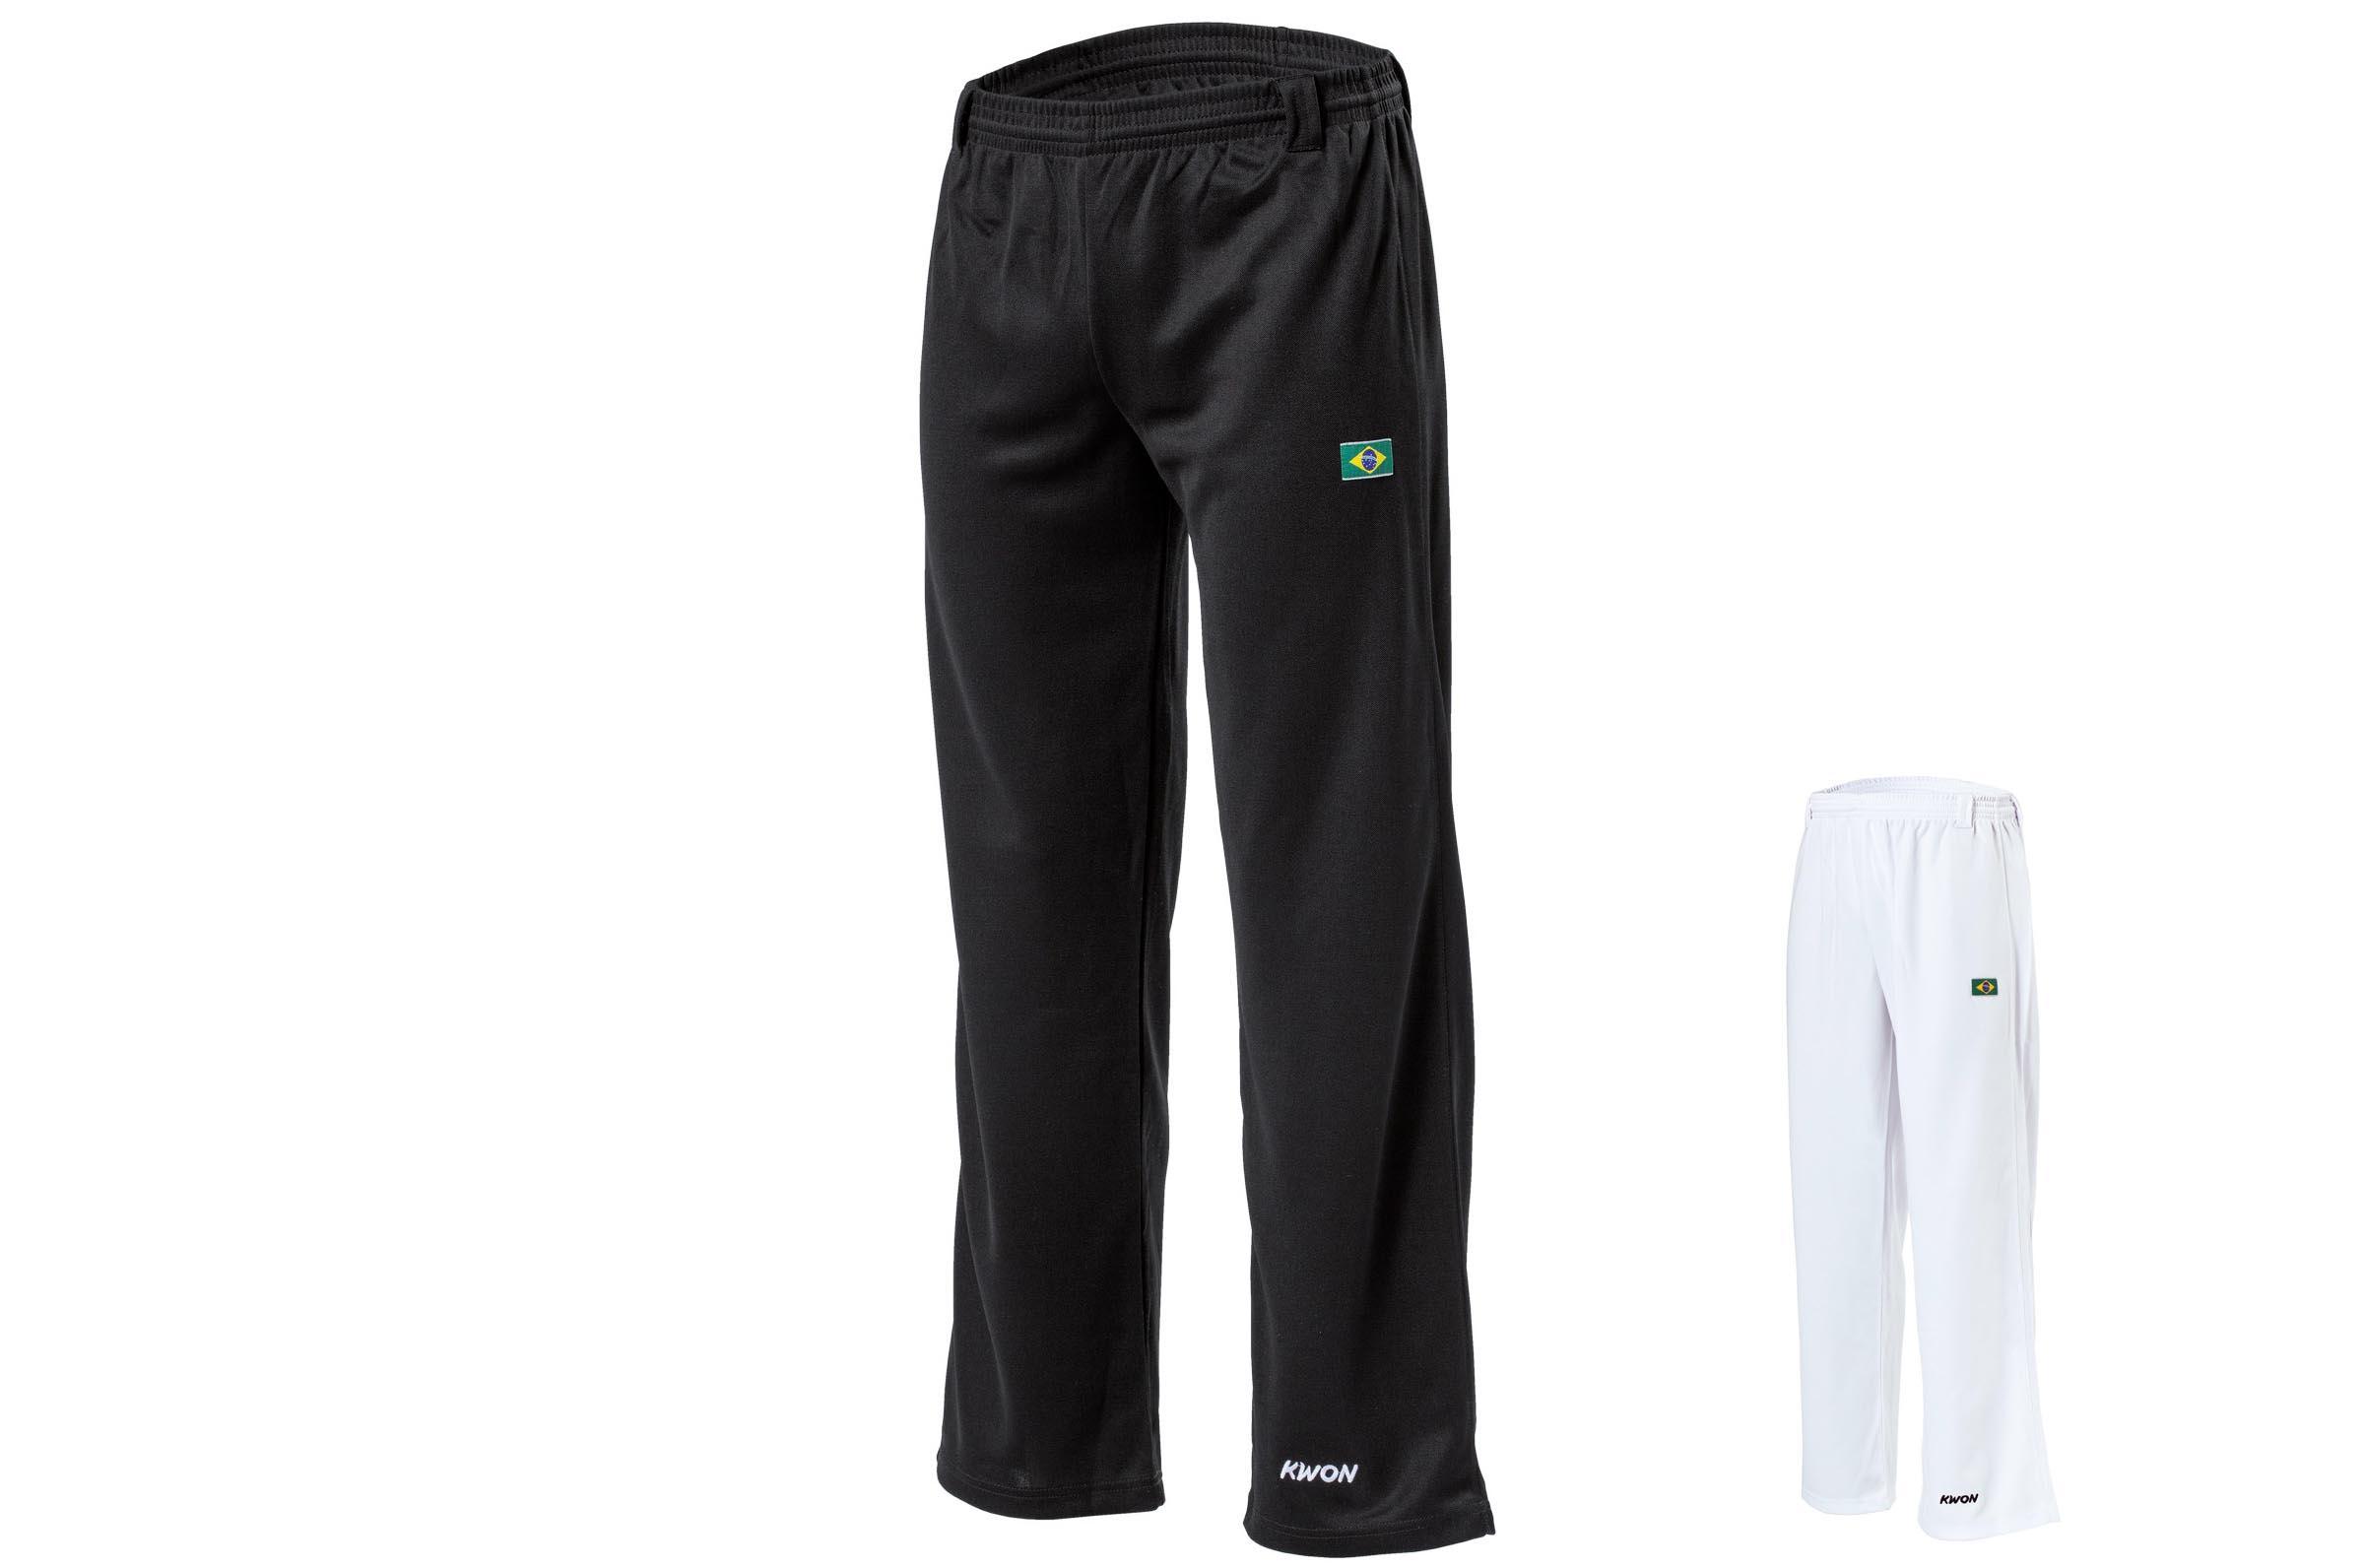 Pantalon de Capoeira, Kwon